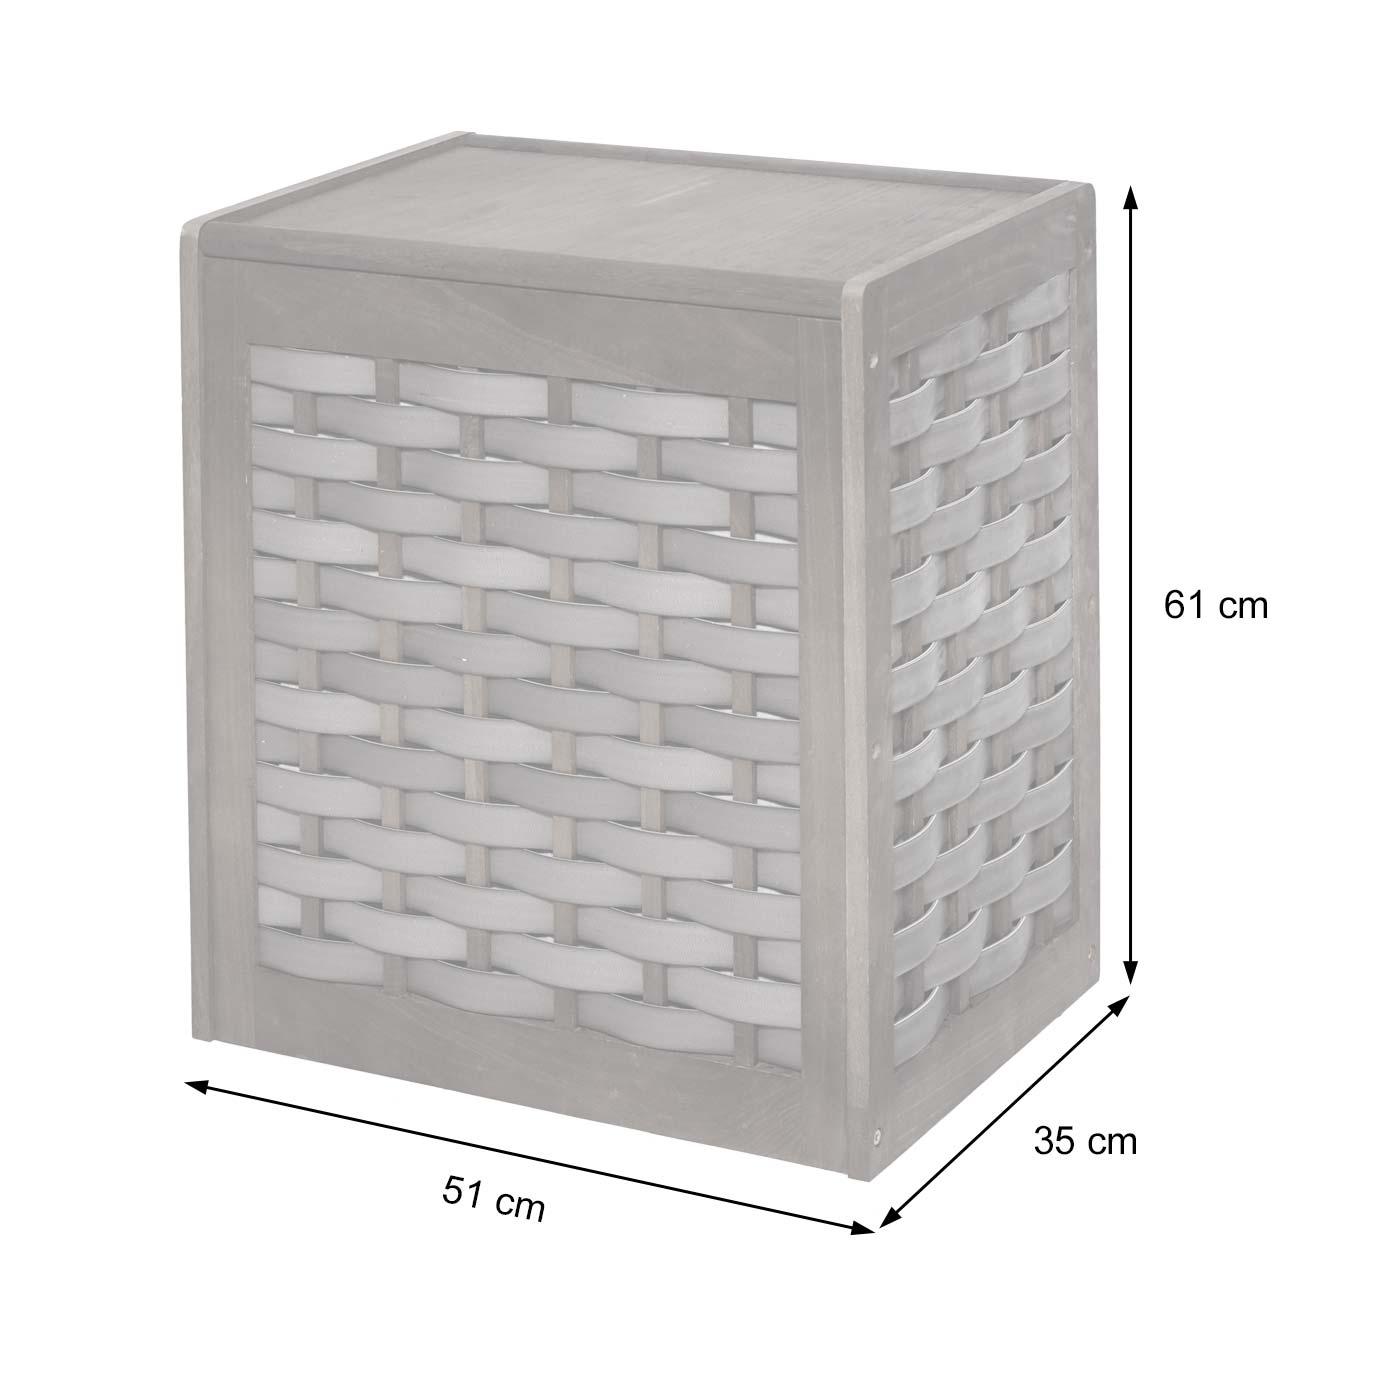 Set Paravent + Wäschekorb HWC-G37 Bemaßungsbild Wäschekorb